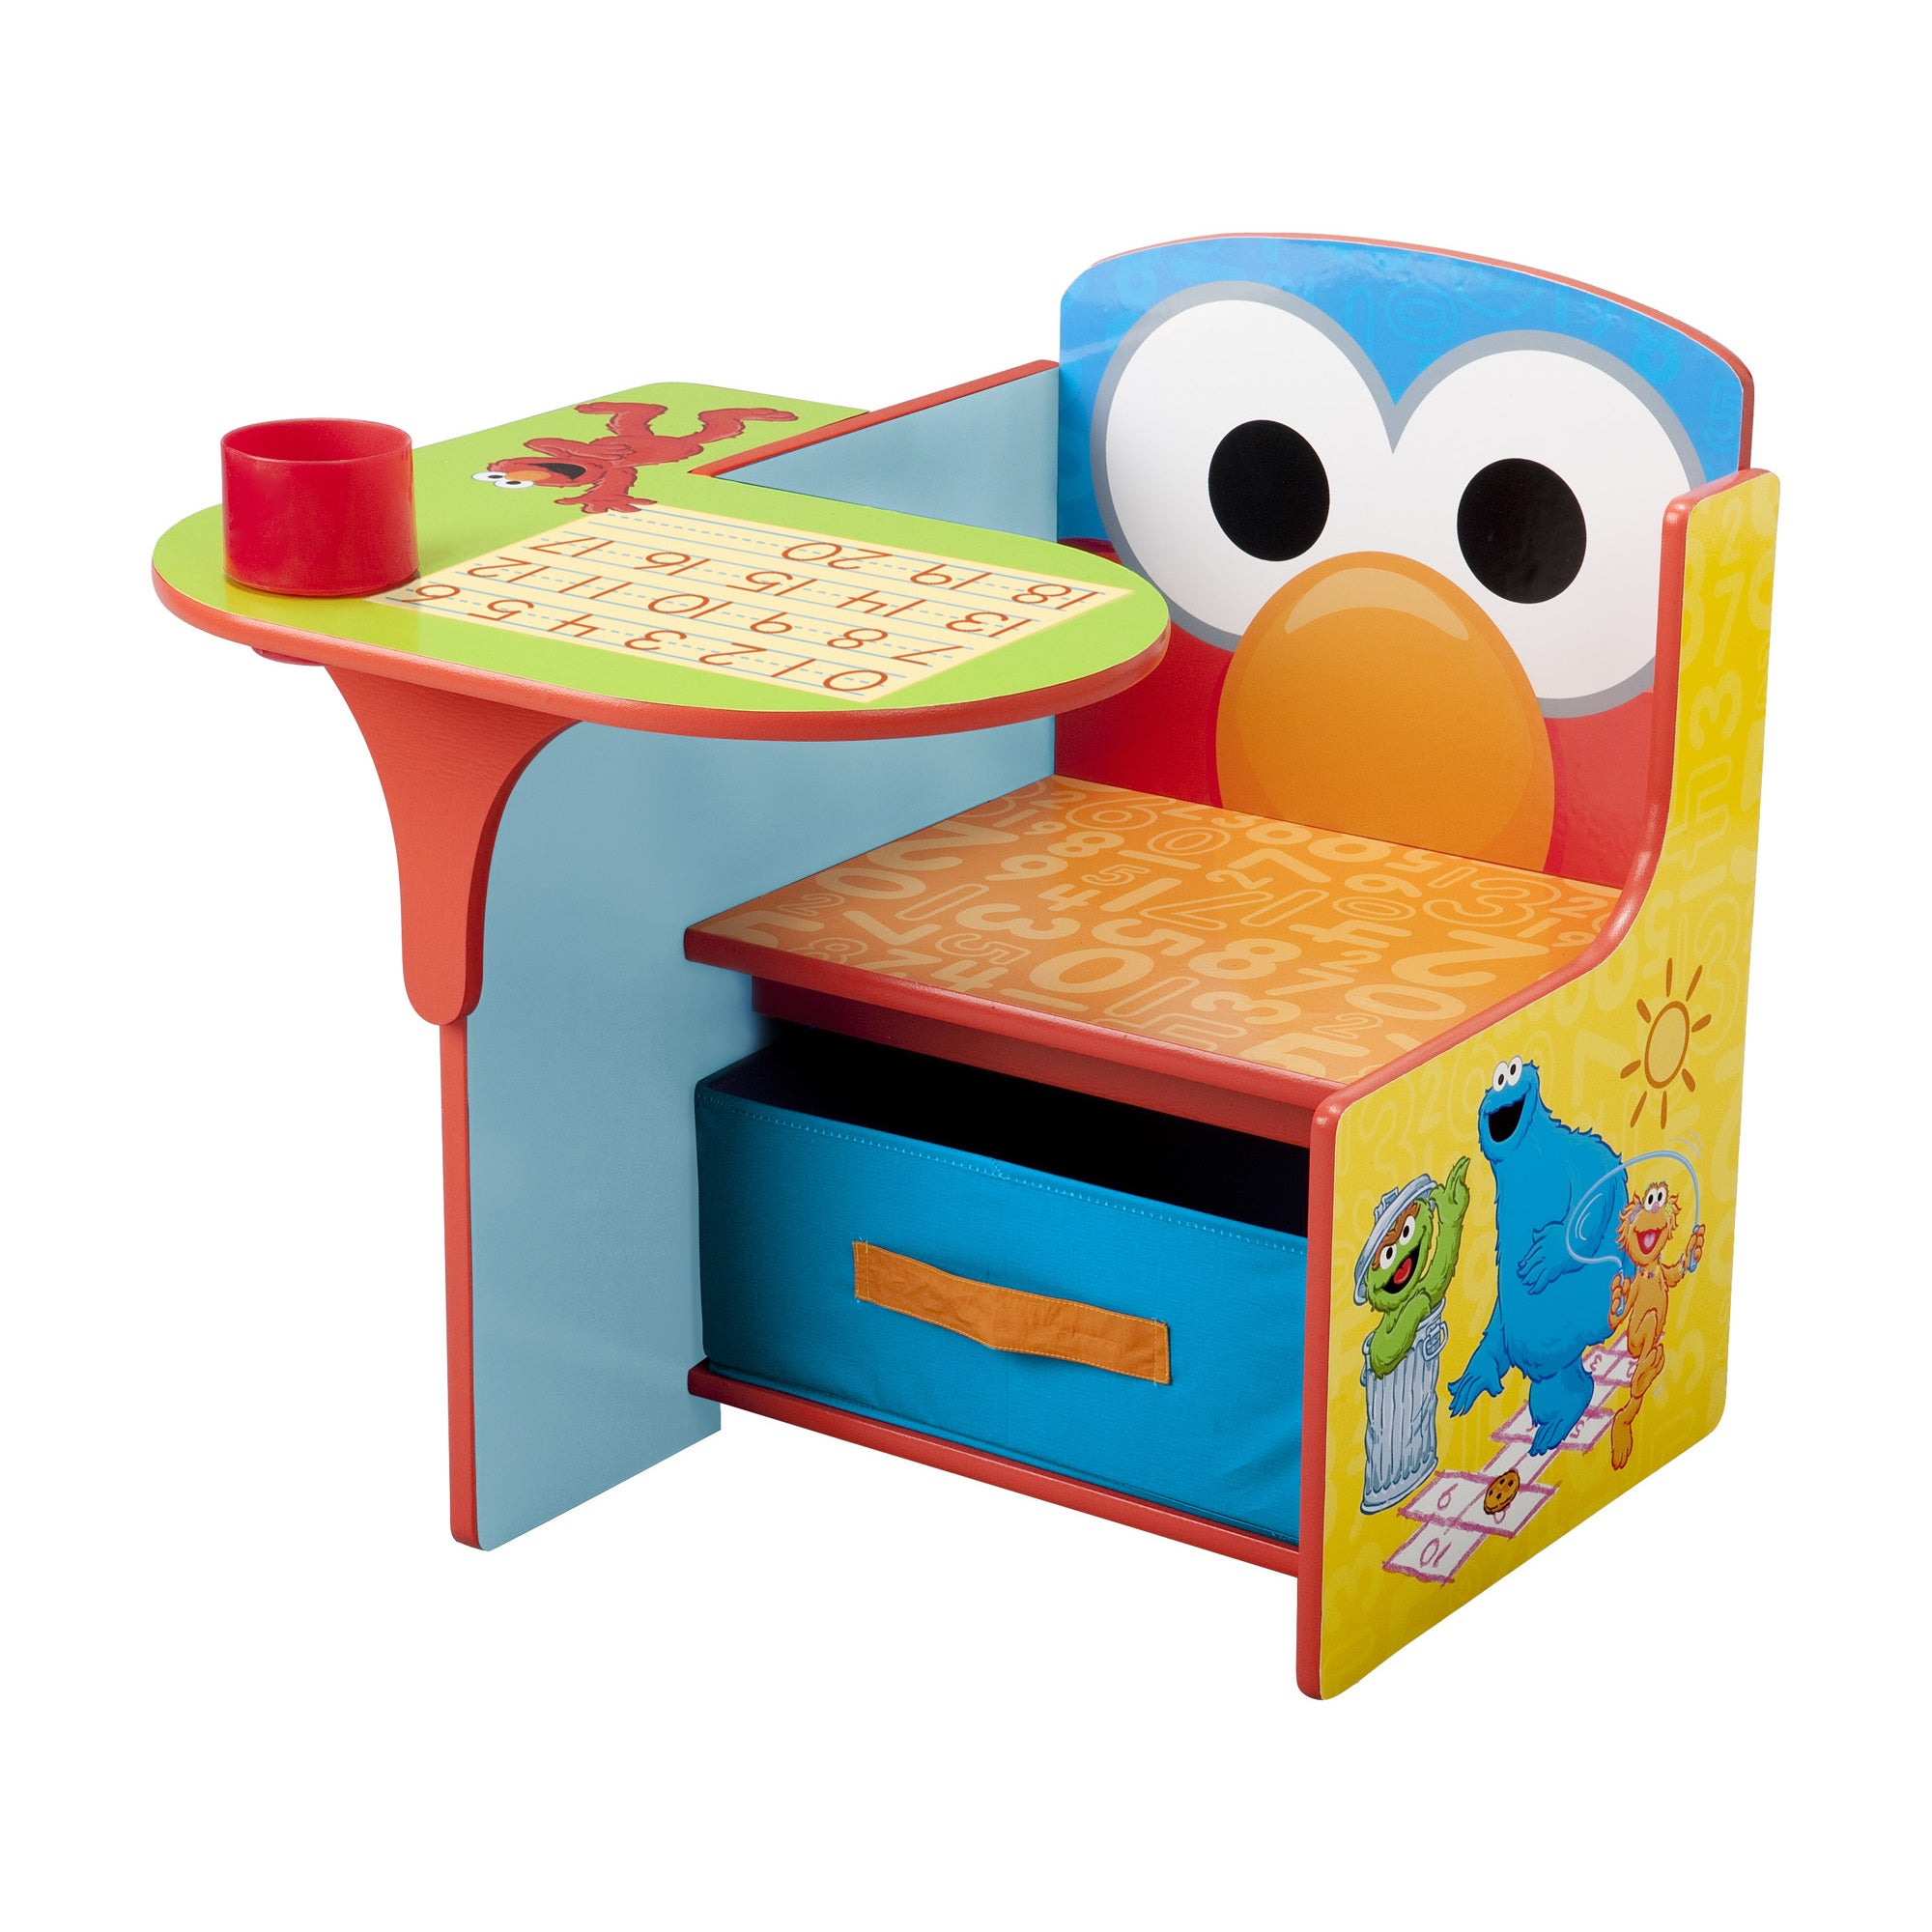 Surprising Sesame Street Chair Desk With Storage Bin By Delta Children Pdpeps Interior Chair Design Pdpepsorg